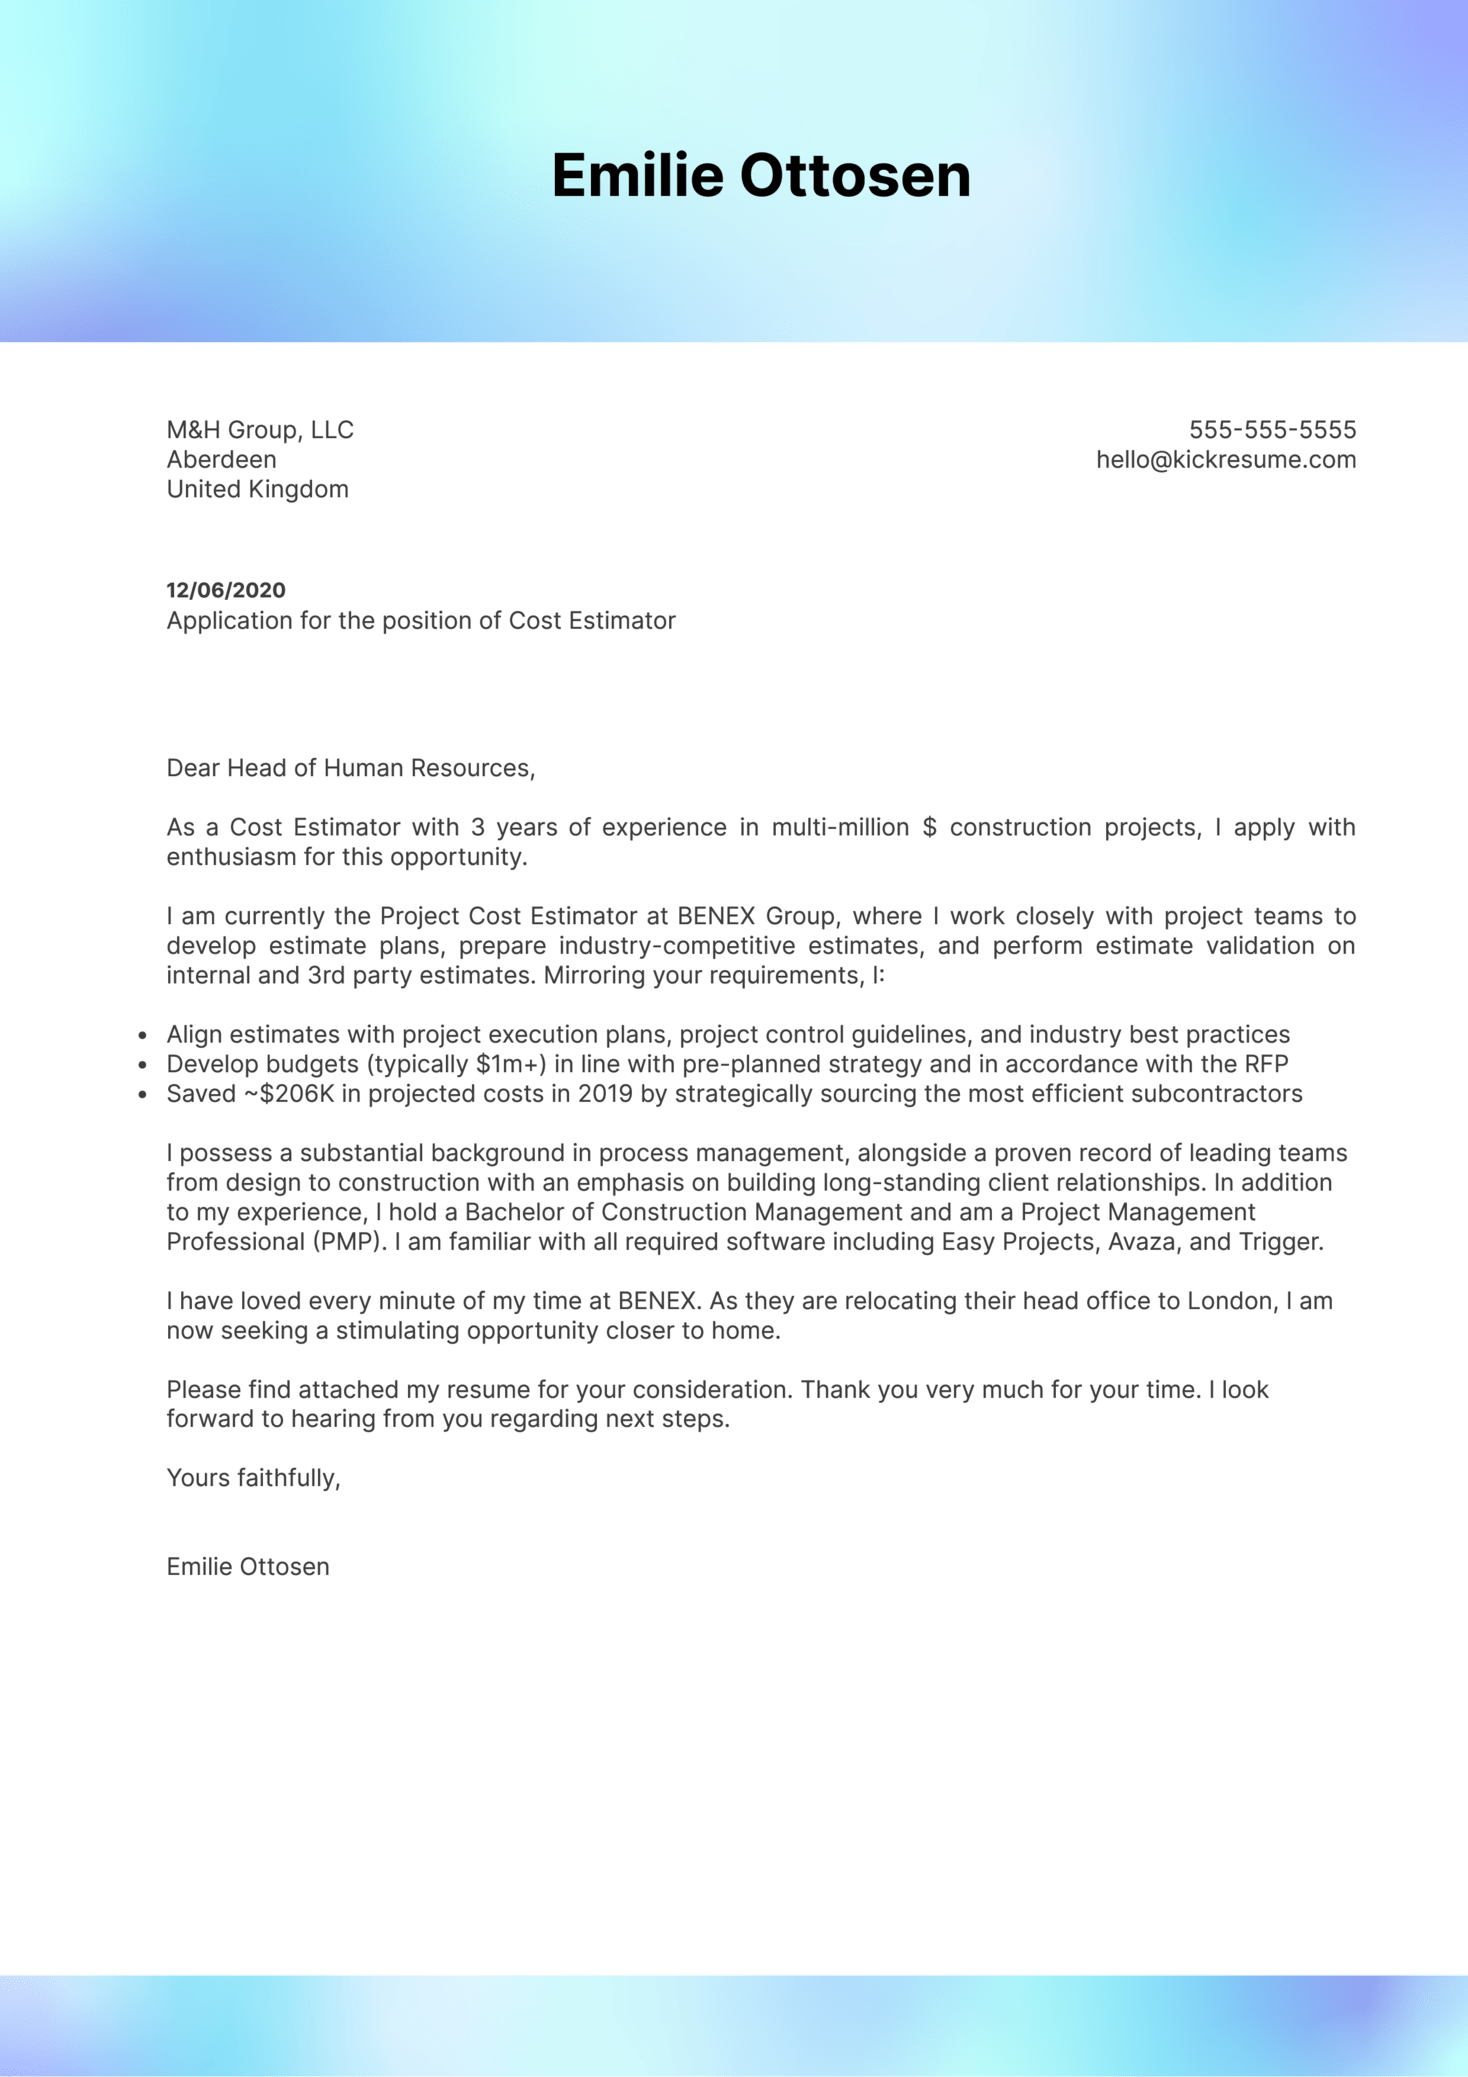 Cost Estimator Cover Letter Example